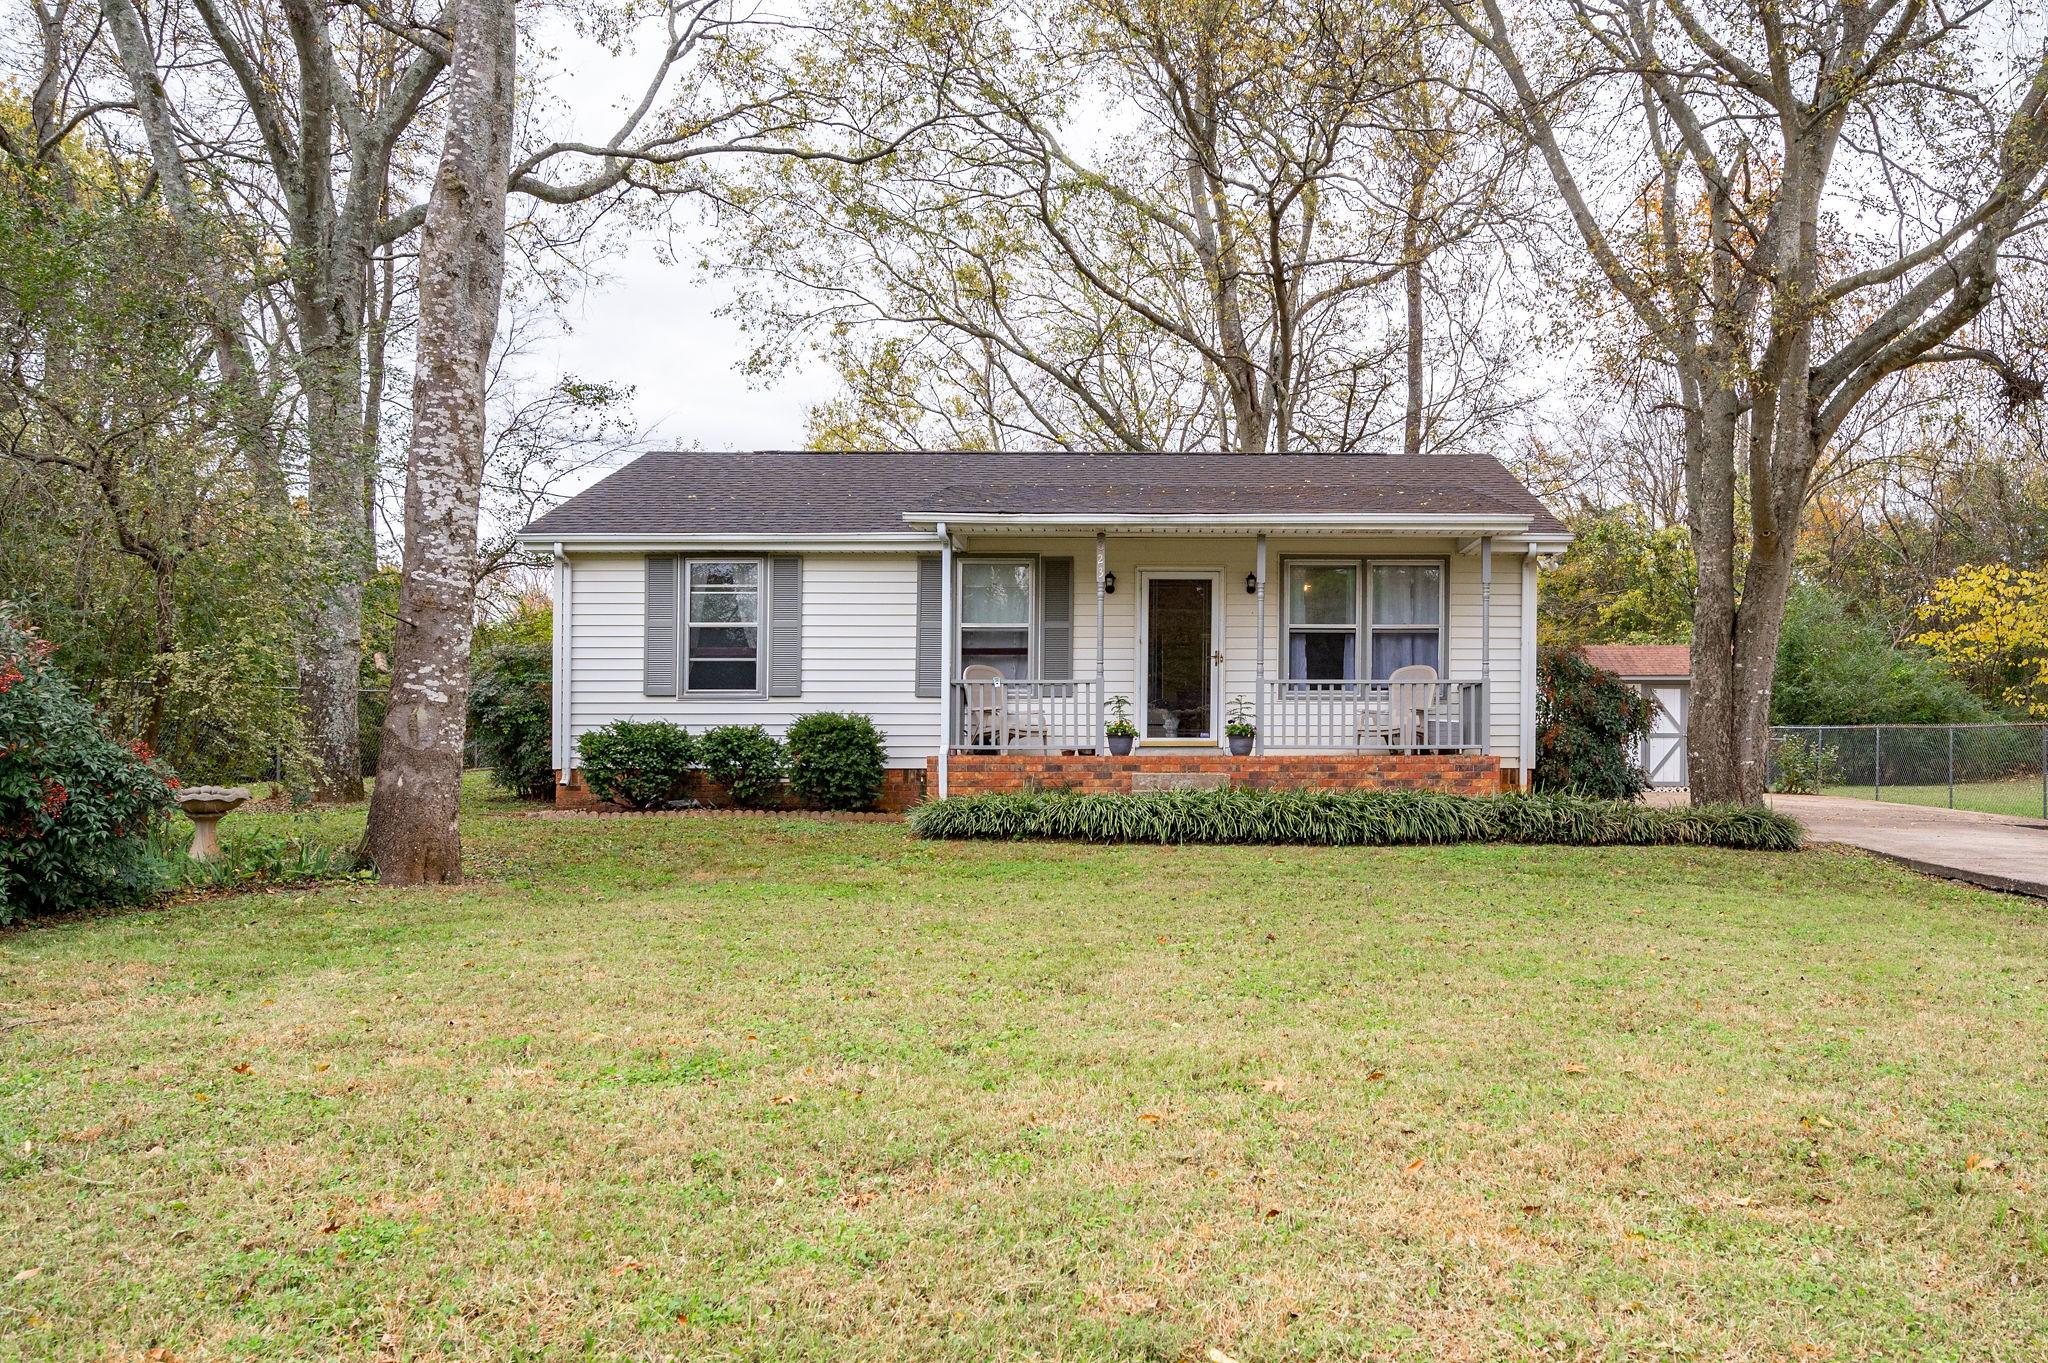 823 Raines St Property Photo - Smyrna, TN real estate listing